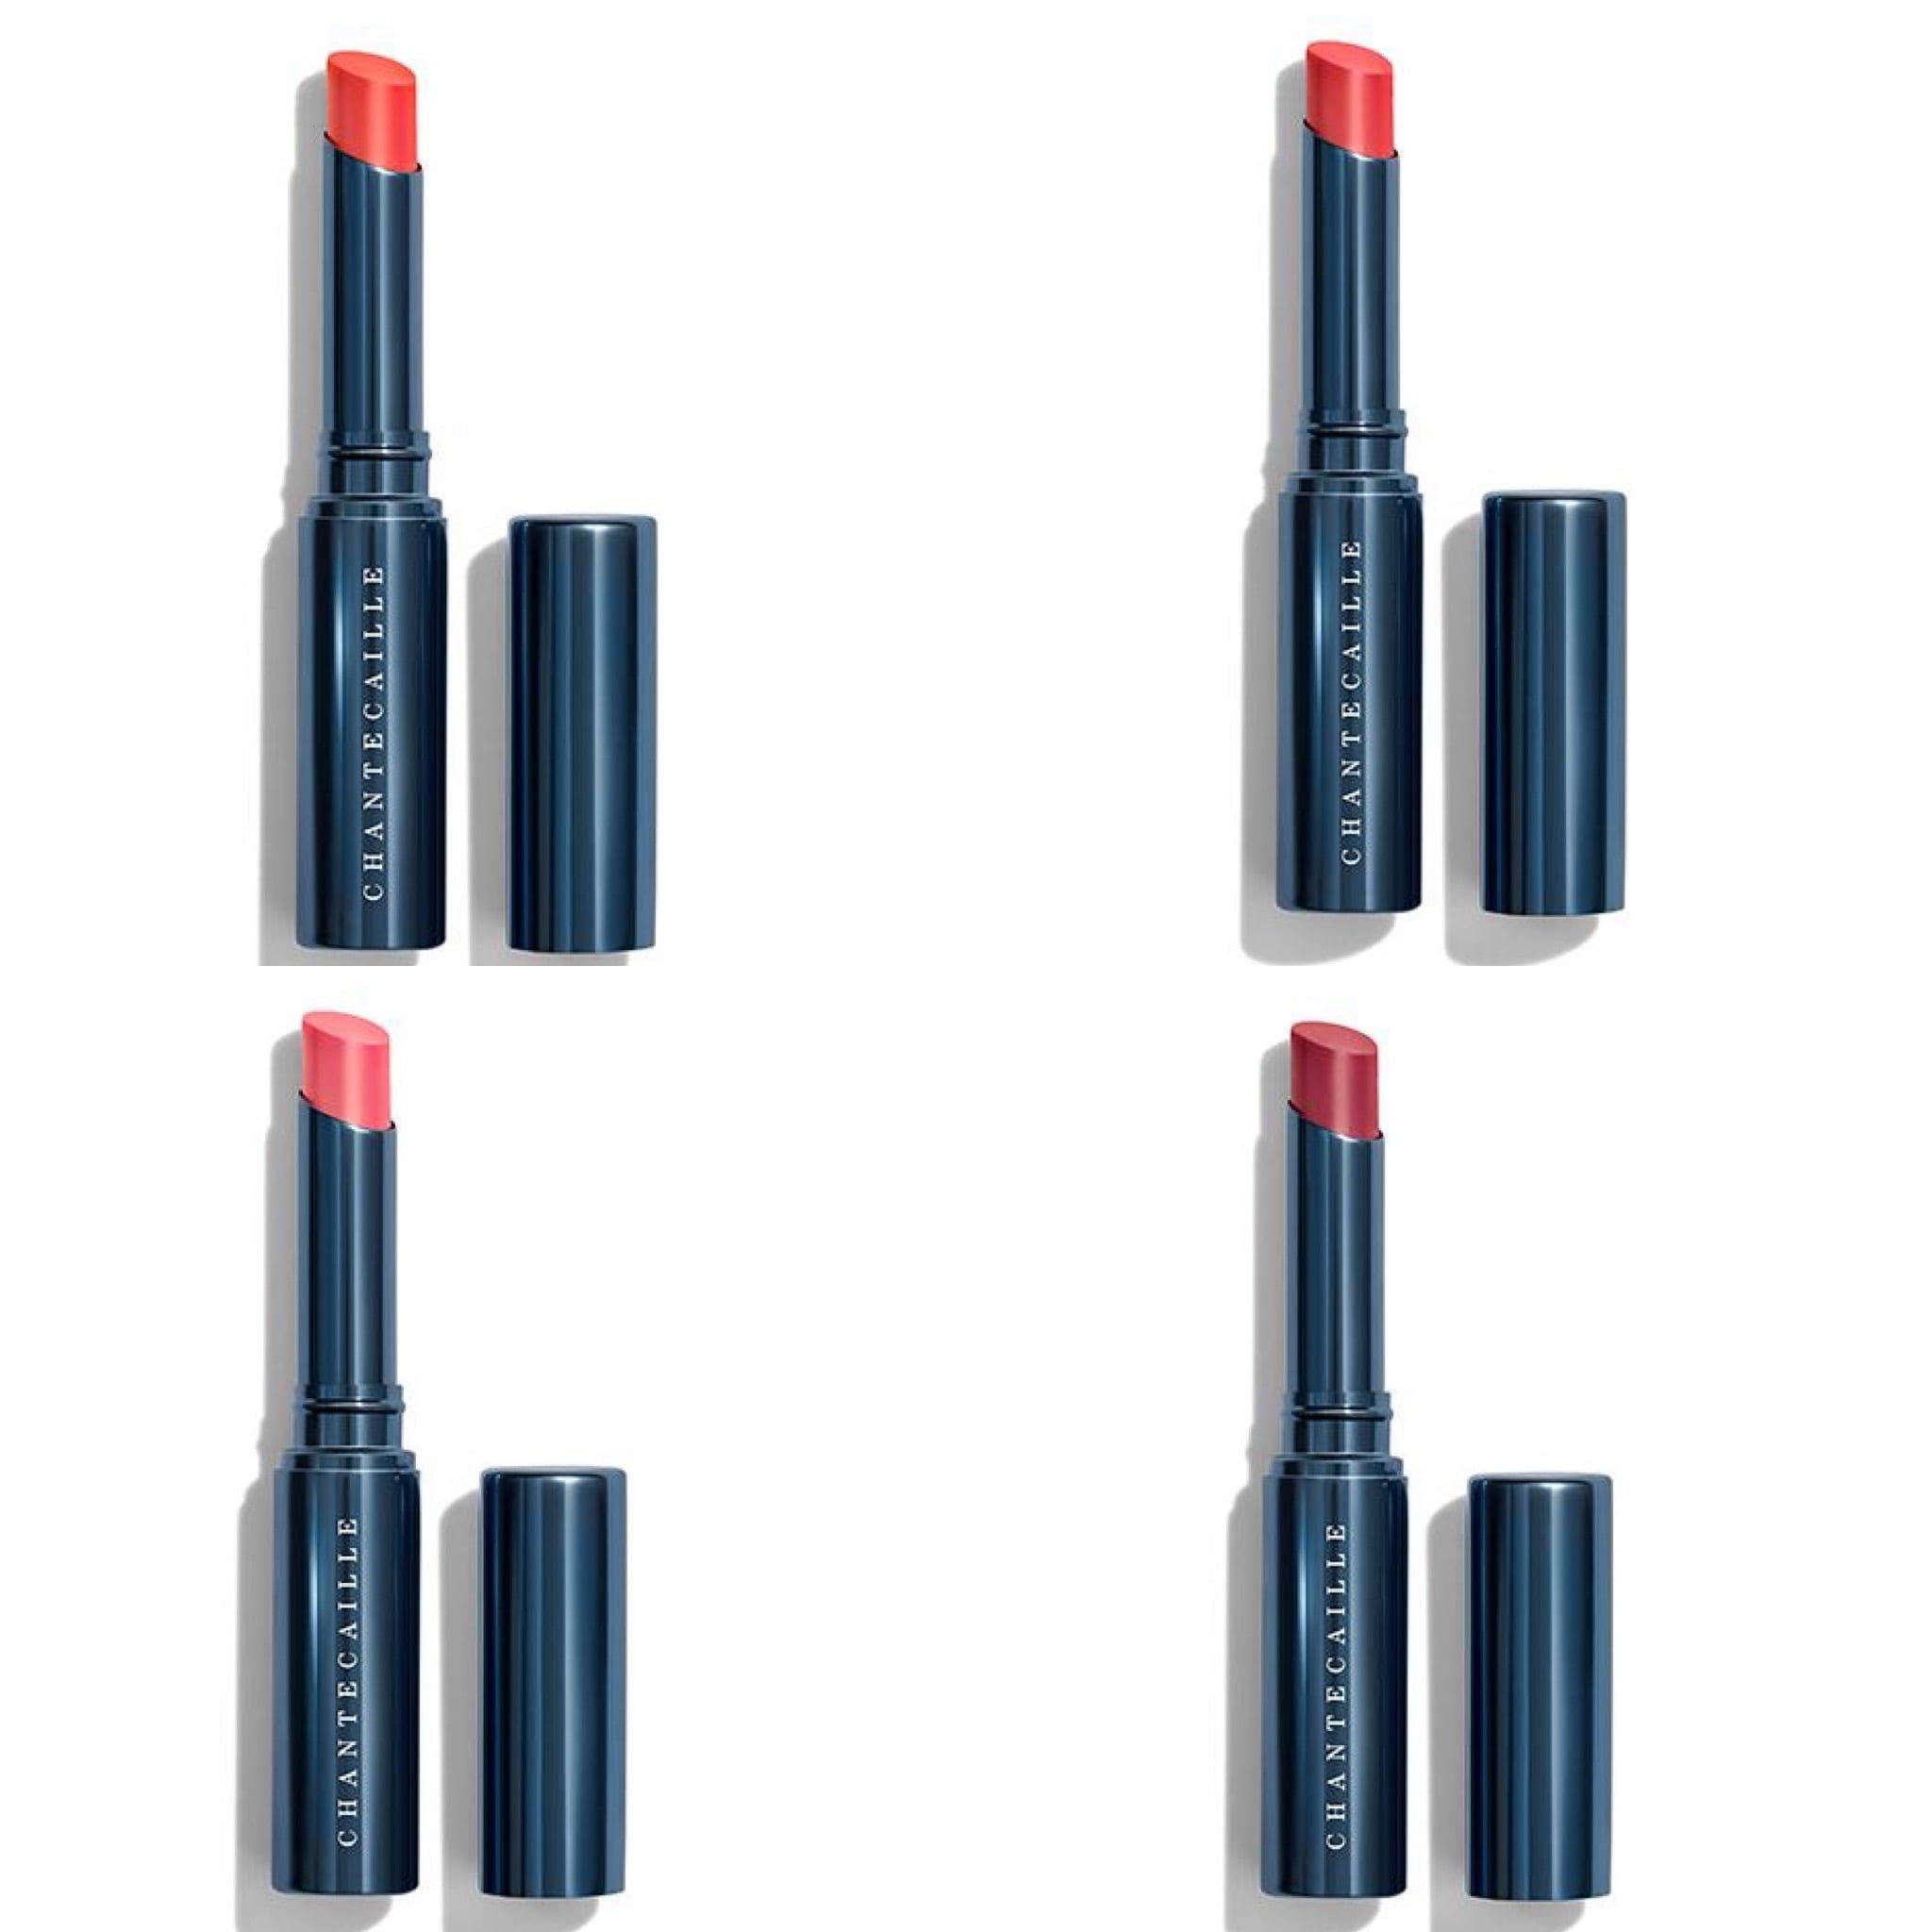 Chantecaille Lip Tint Hydrating Balm Collection